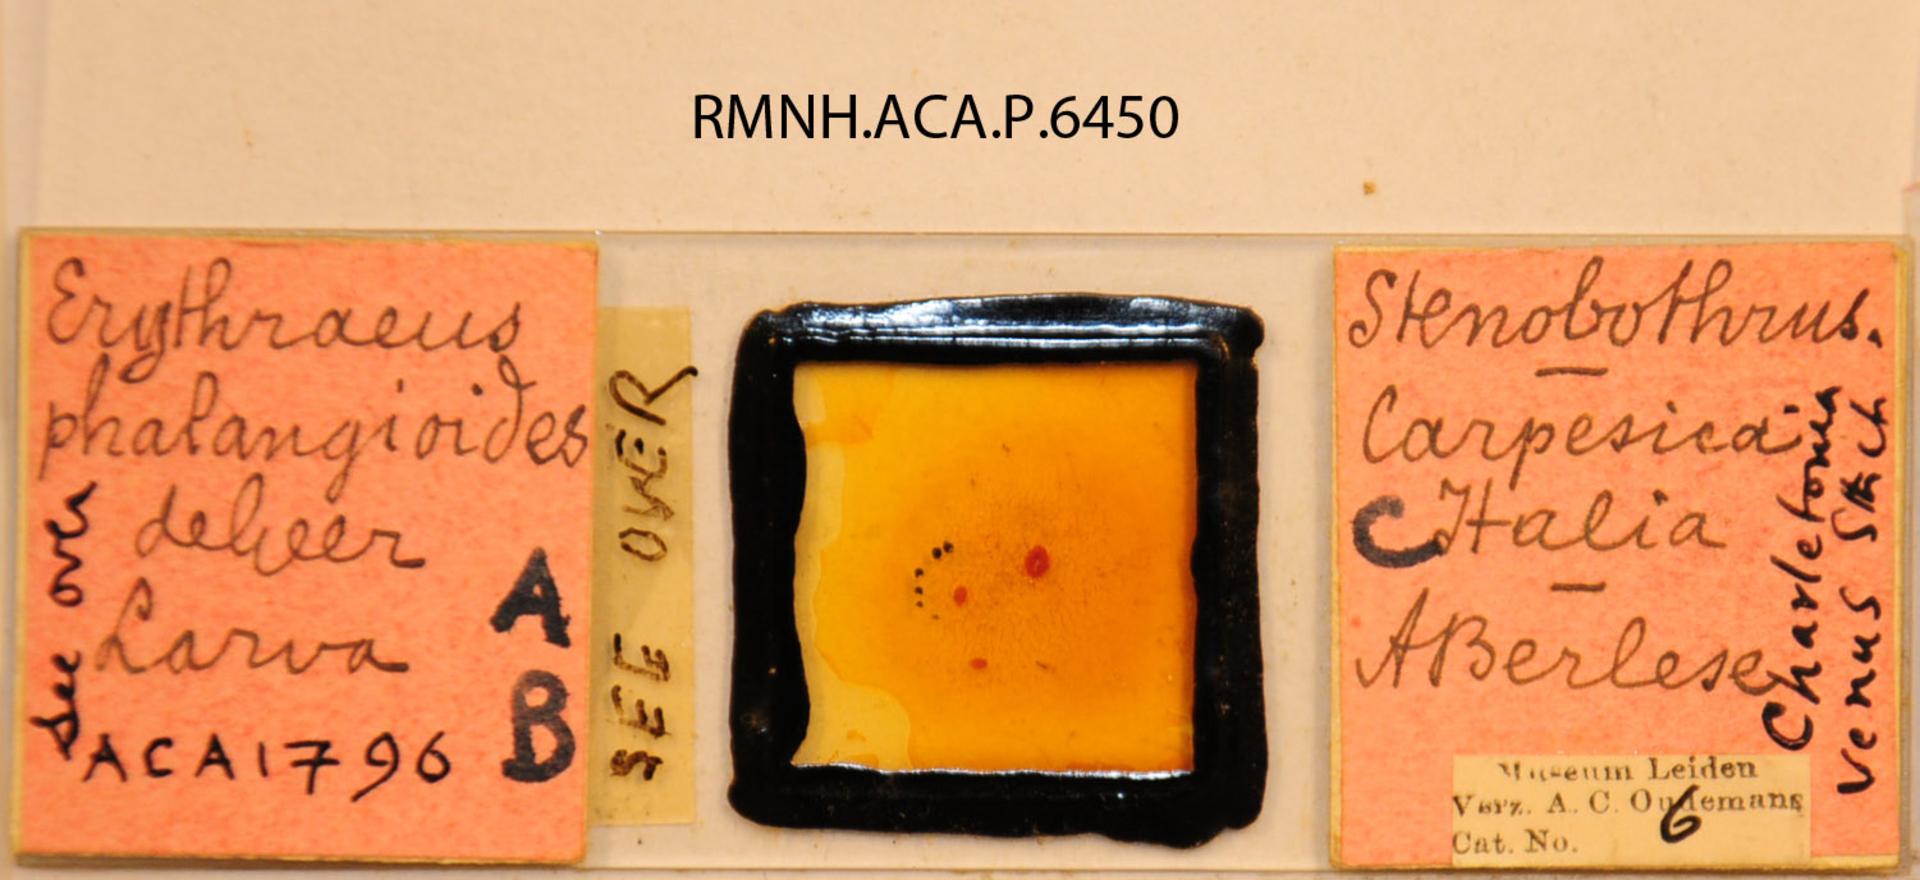 RMNH.ACA.P.6450 | Charletonia venus Southcutt, 1966